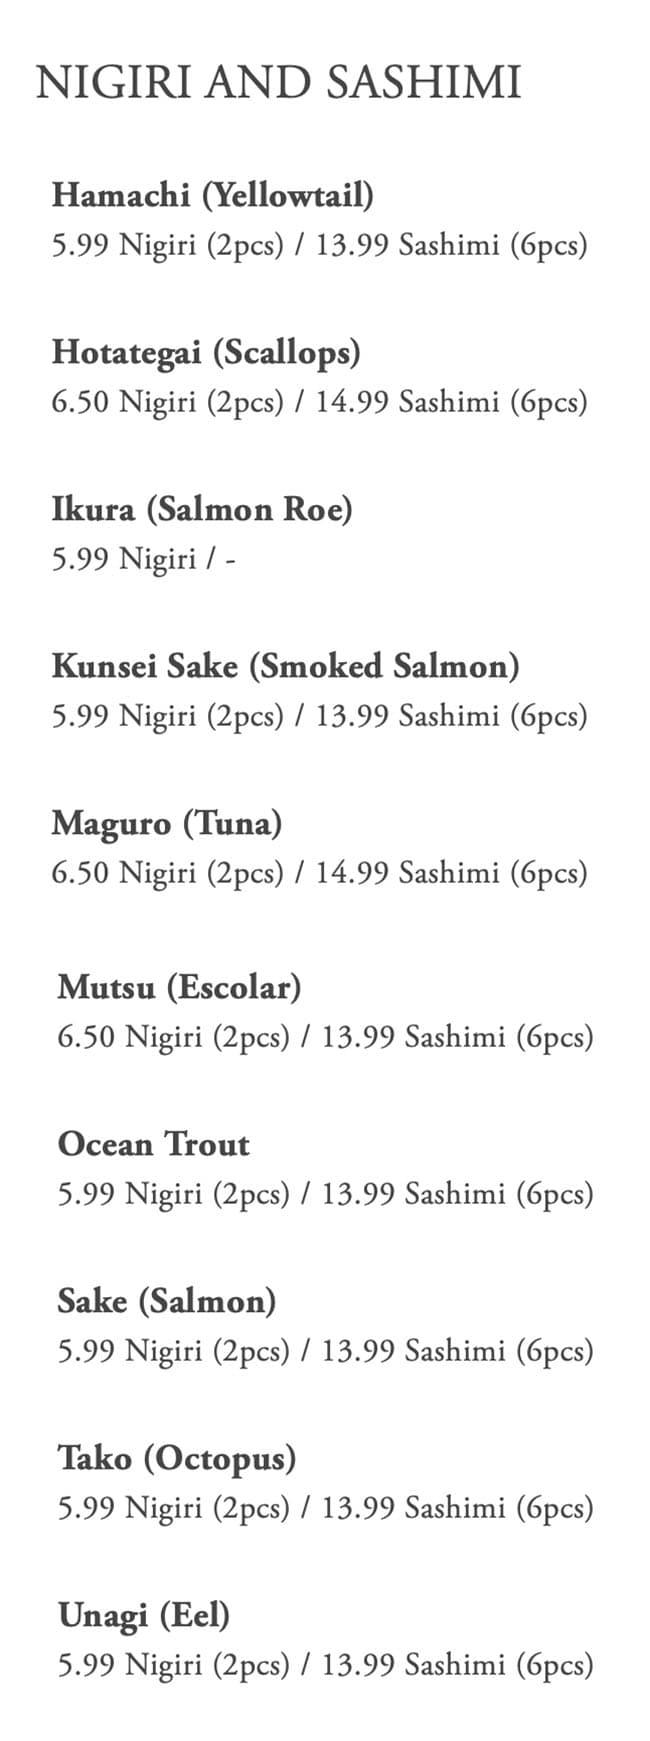 Kaze Sushi Bar And Grill menu - nigiri and sashimi